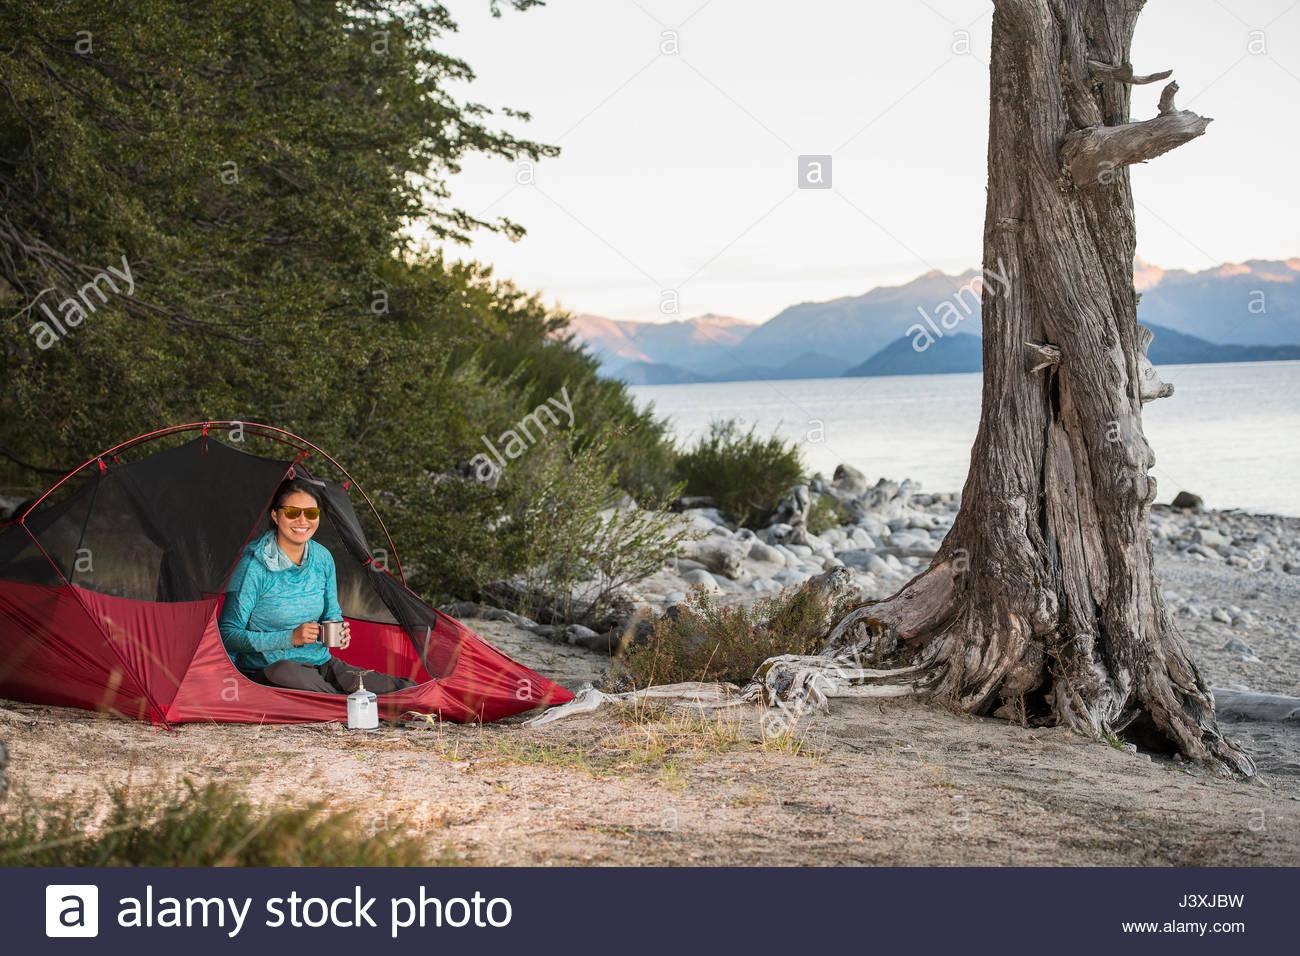 Woman camping at Nahuel Huapi Lake in Patagonia - Stock Image